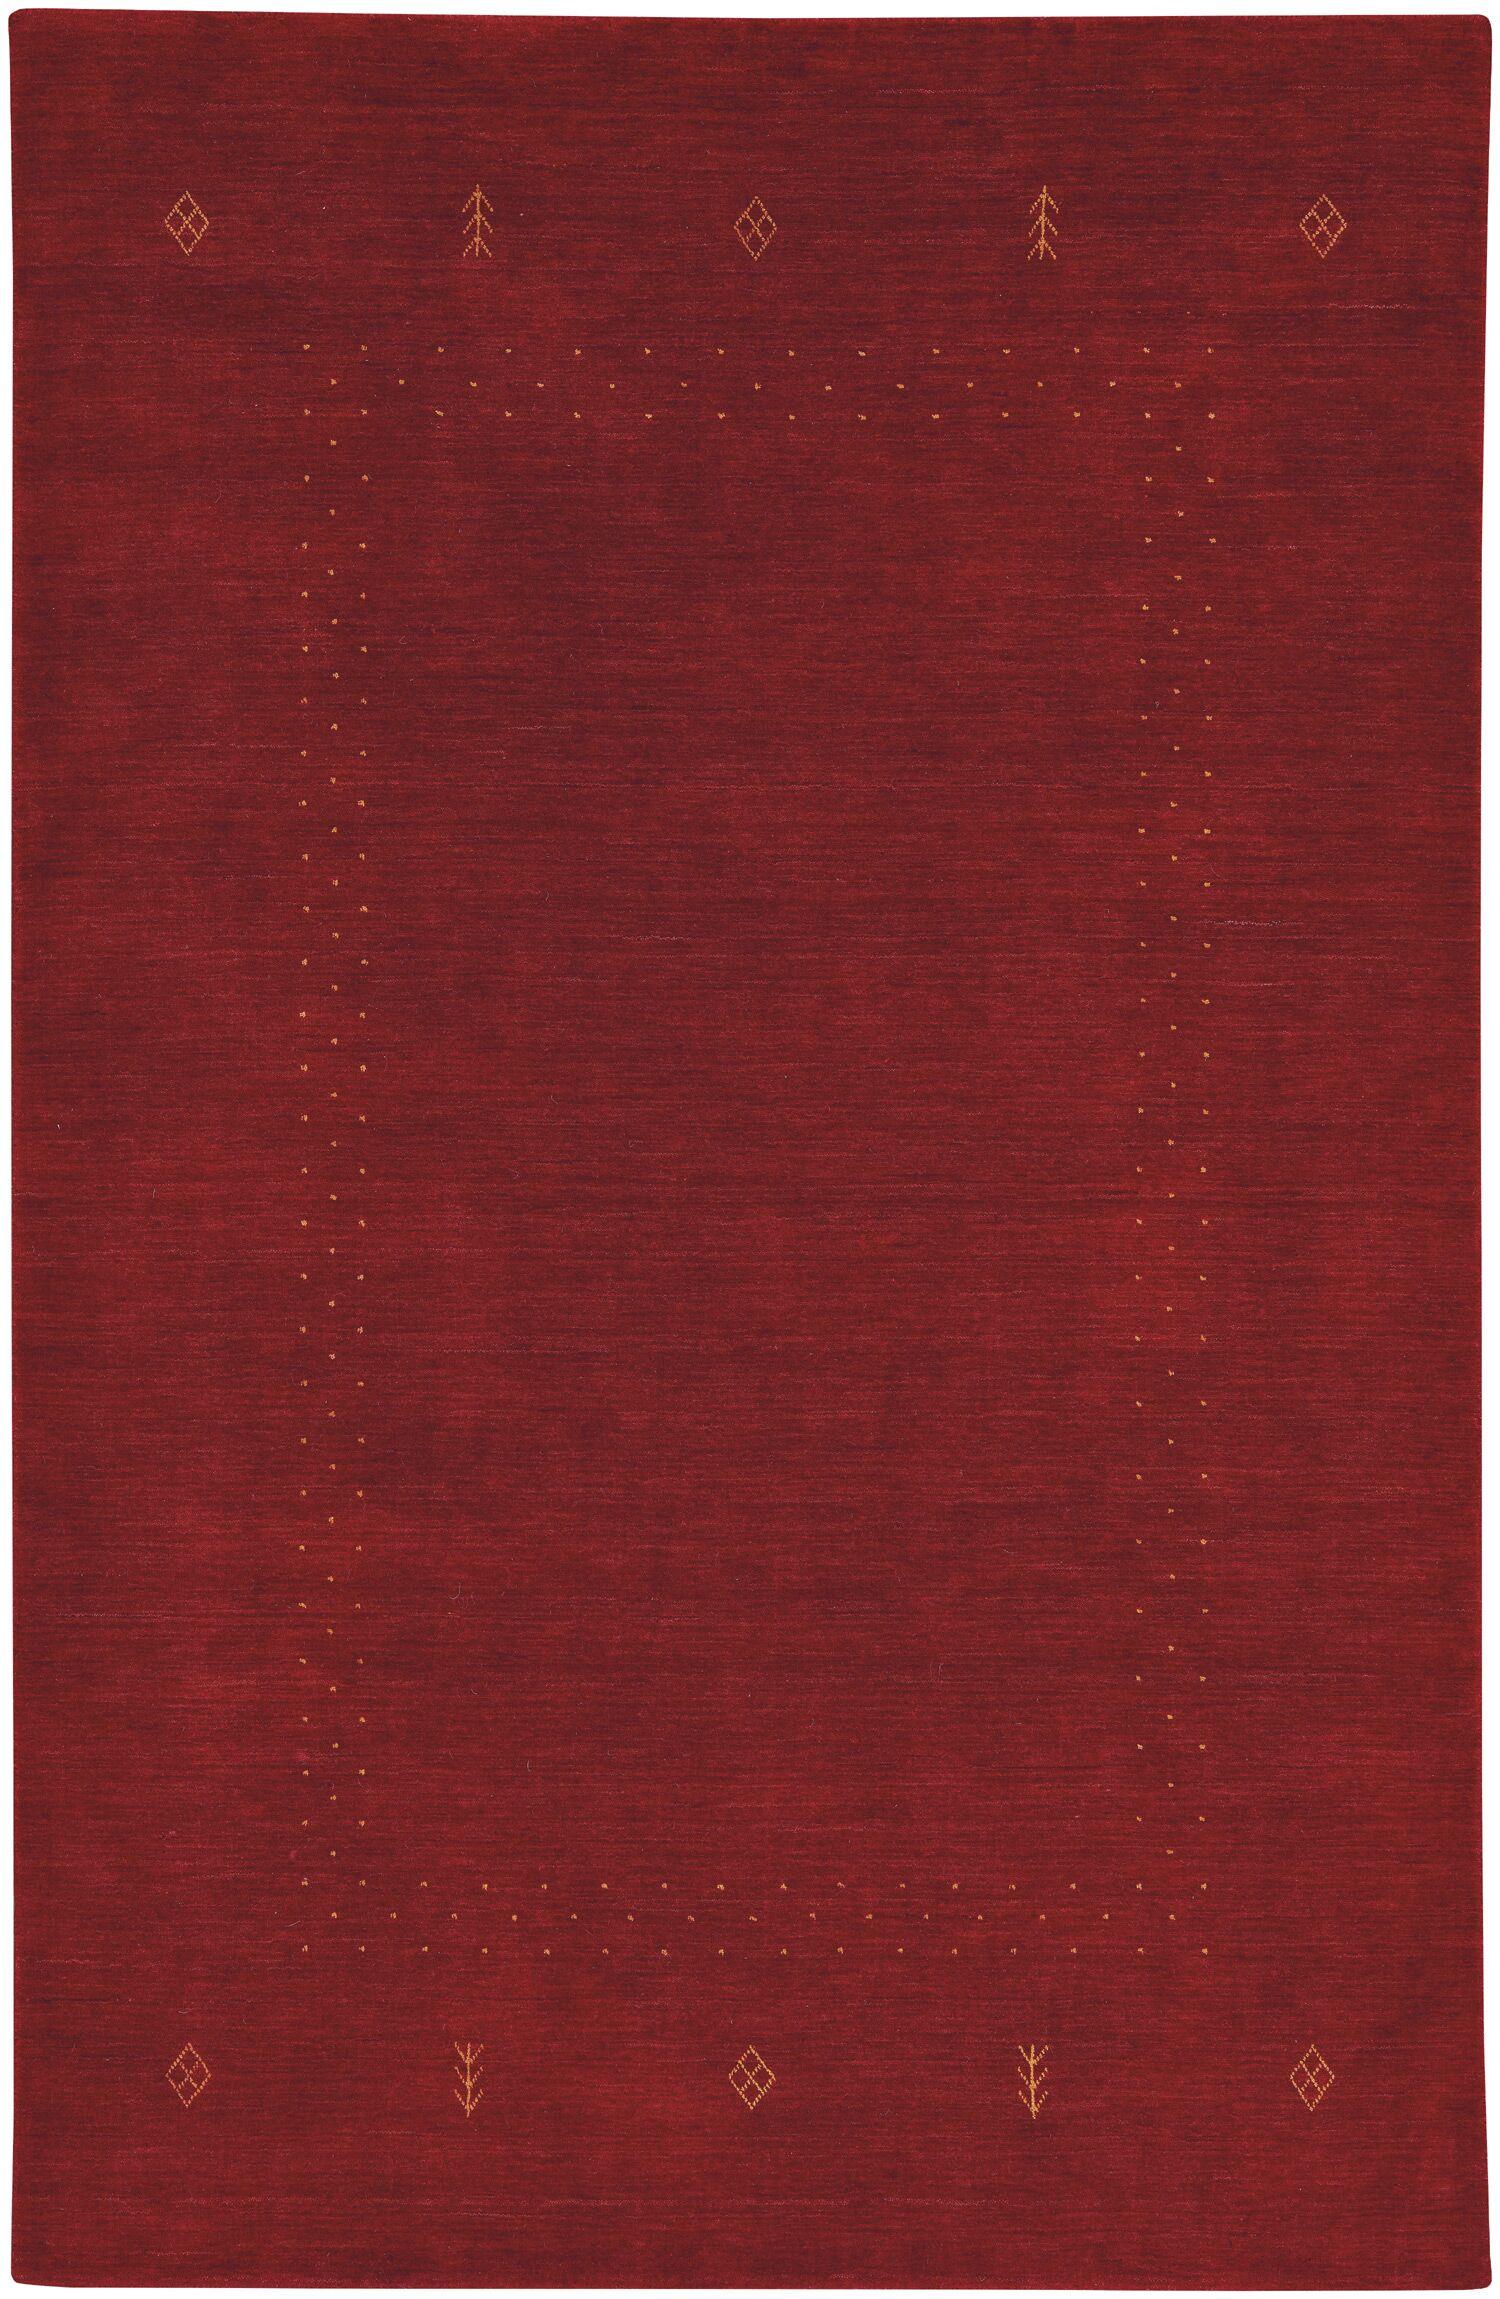 Gava Hand-Tufted Crimson Area Rug Rug Size: Rectangle 8' x 10'